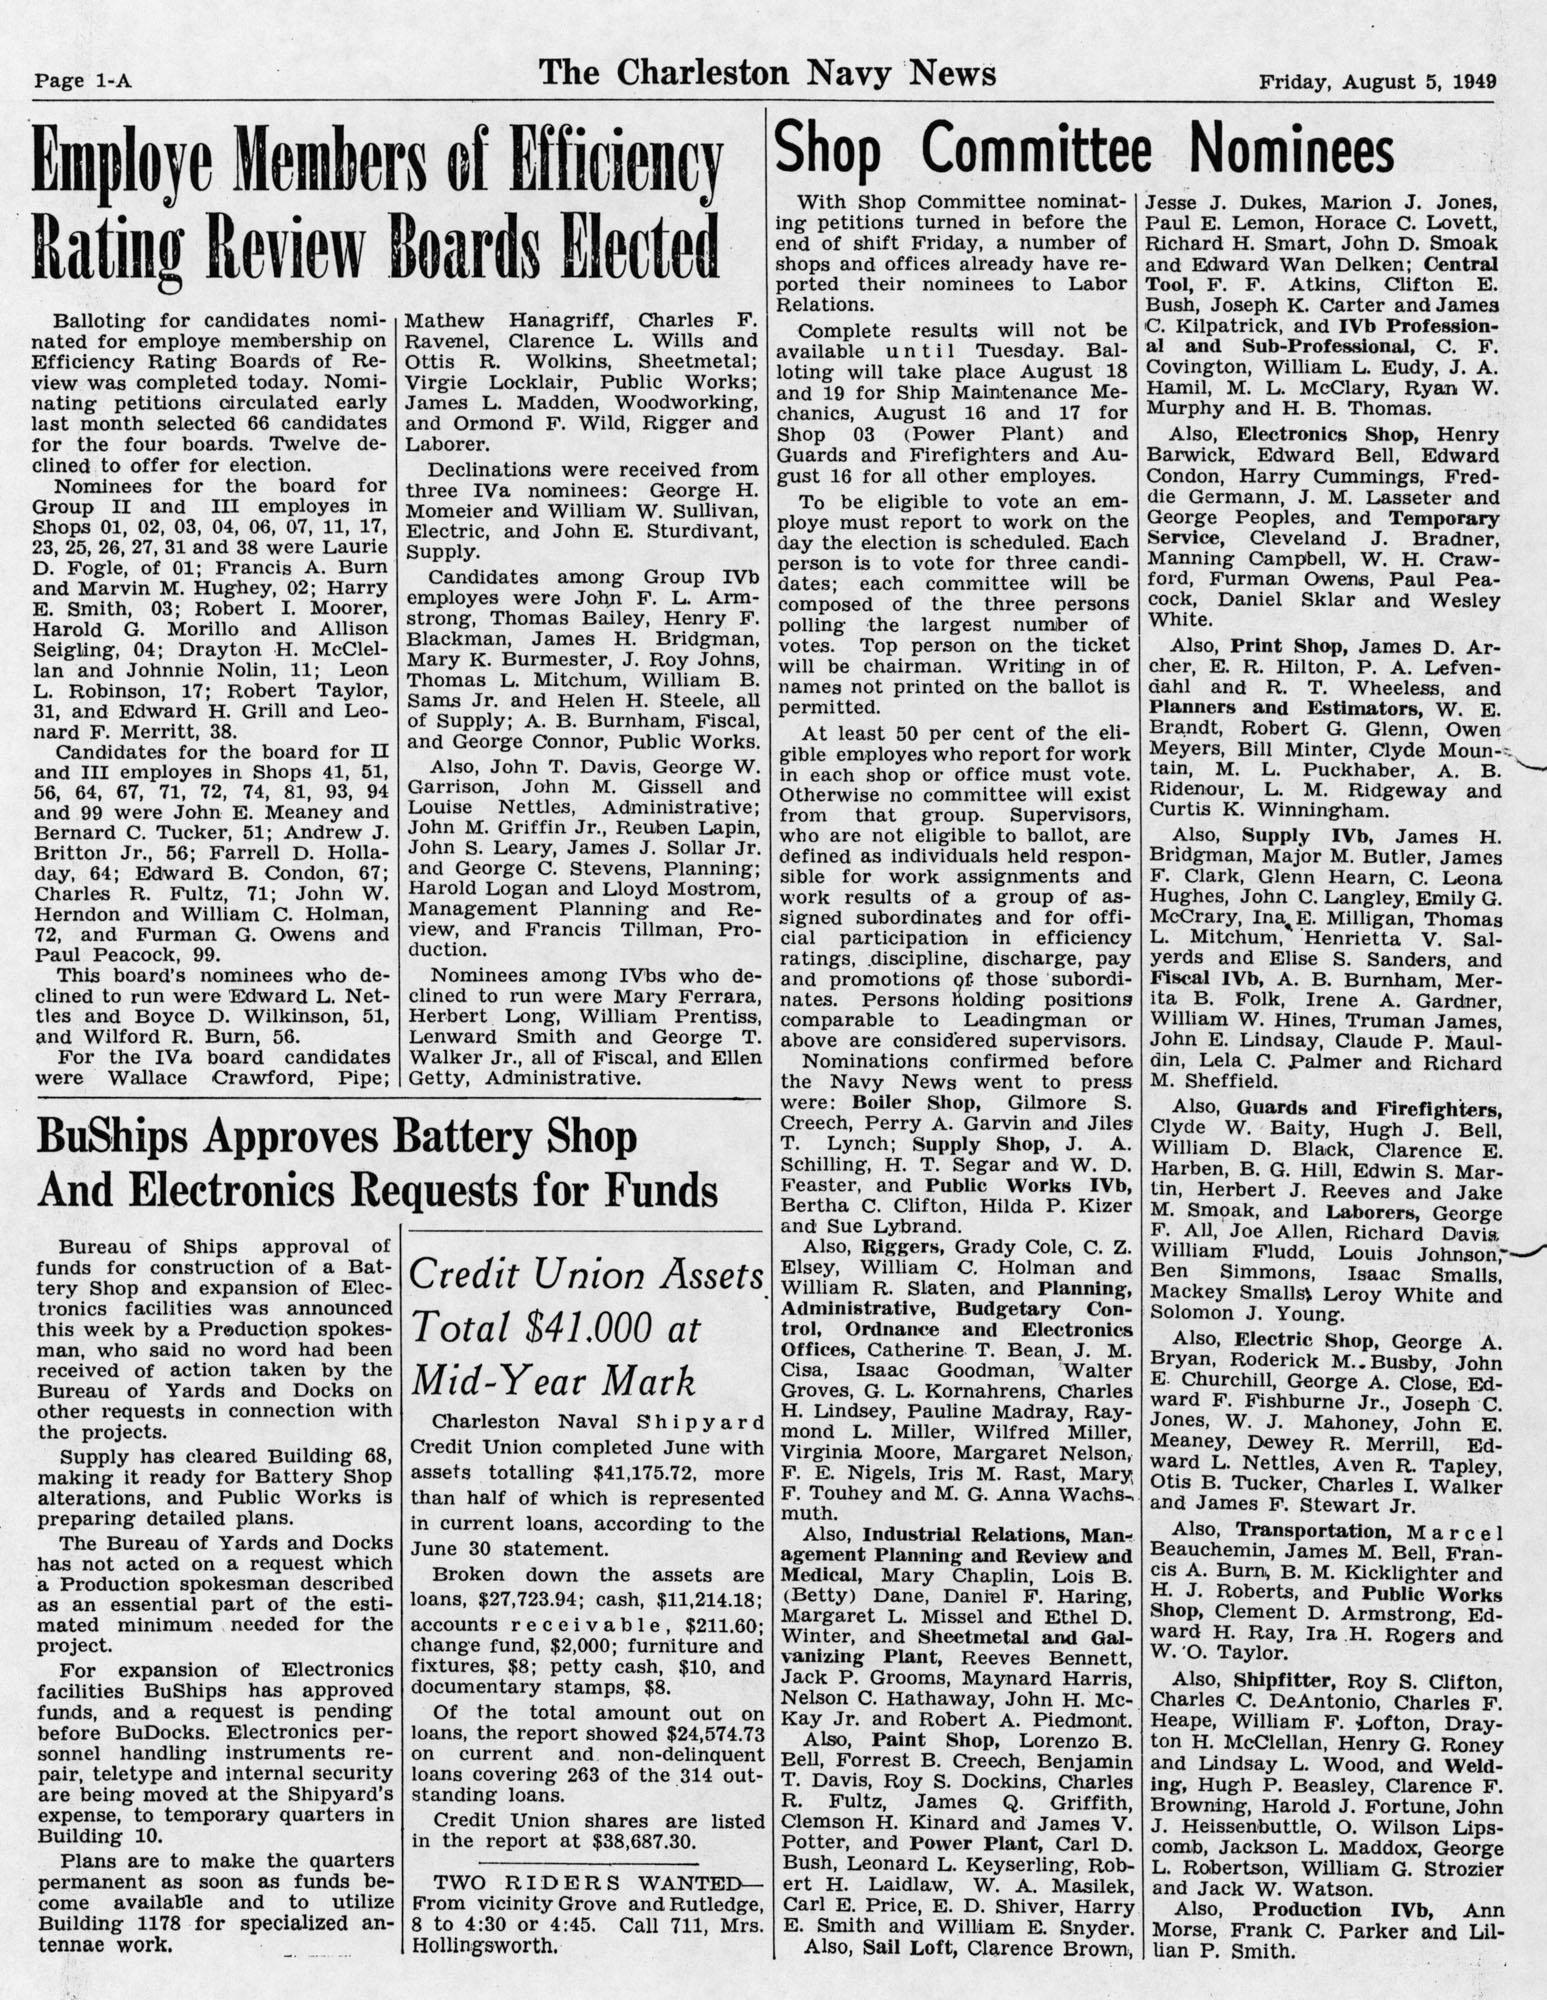 The Charleston Navy News, Volume 8, Edition 1, page ia